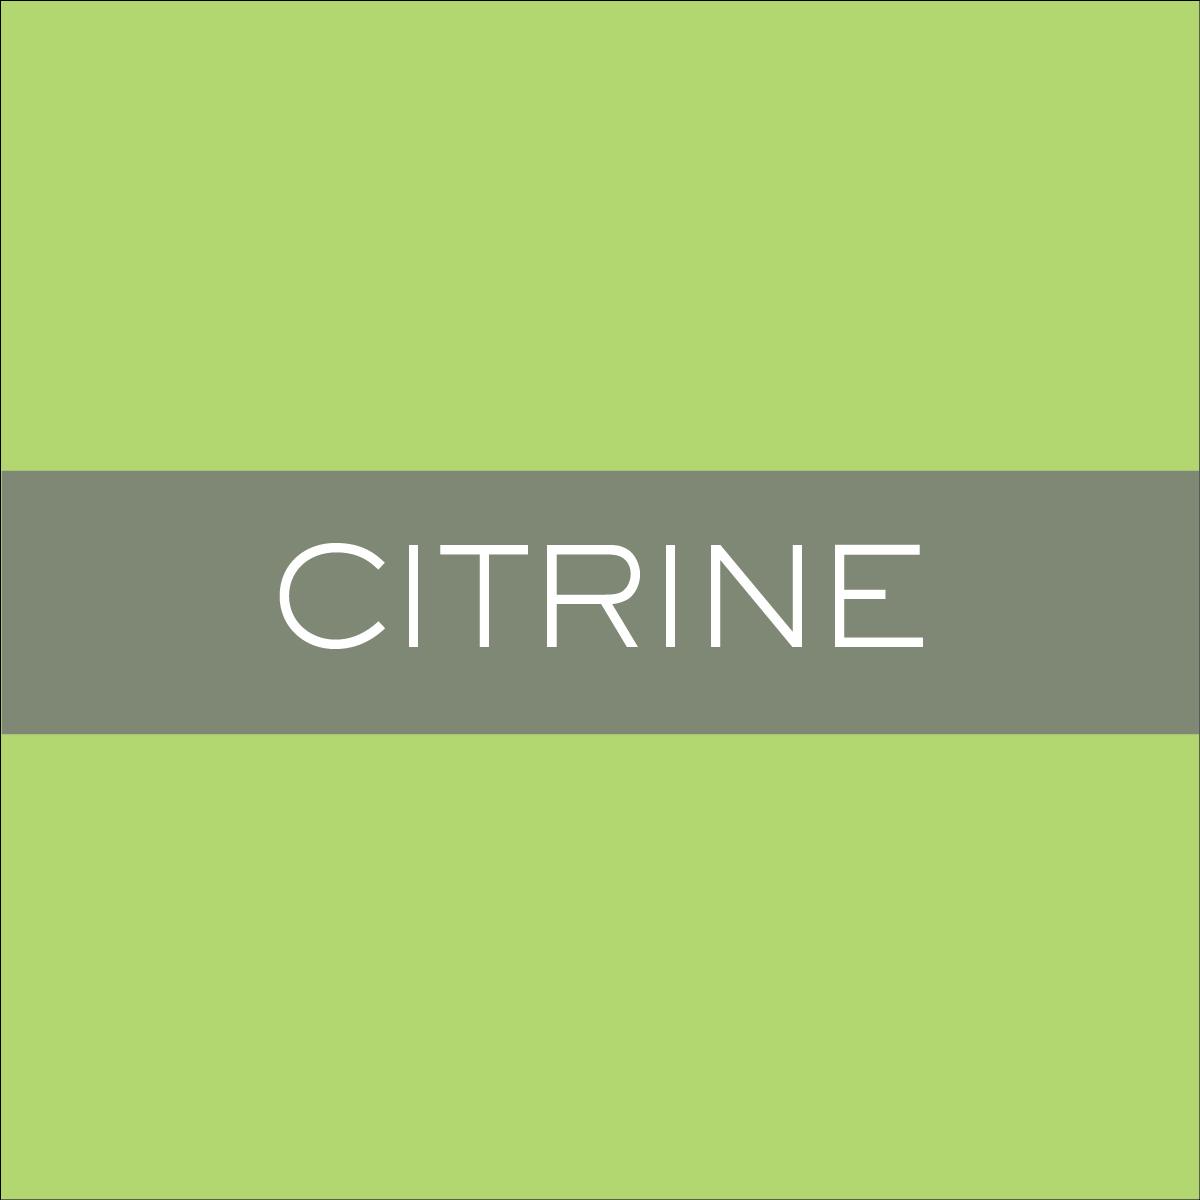 INK_Citrine.jpg